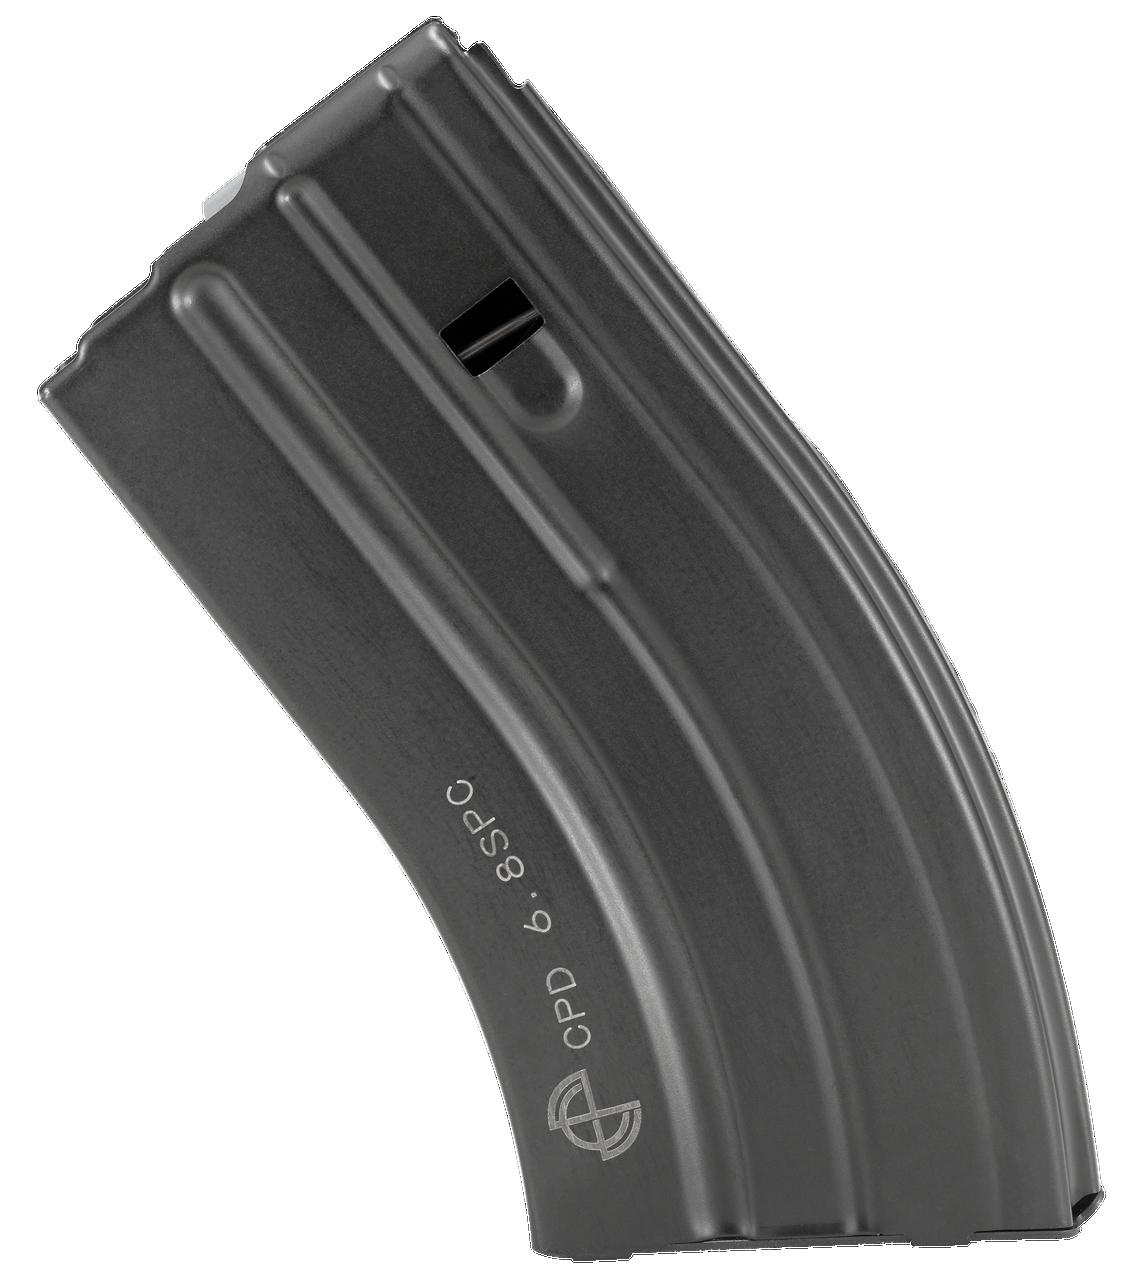 C Products Defense Inc Duramag Rifle, Cpd 2068041207cpd 6.8    20rd  Blk Mag Gry Followr